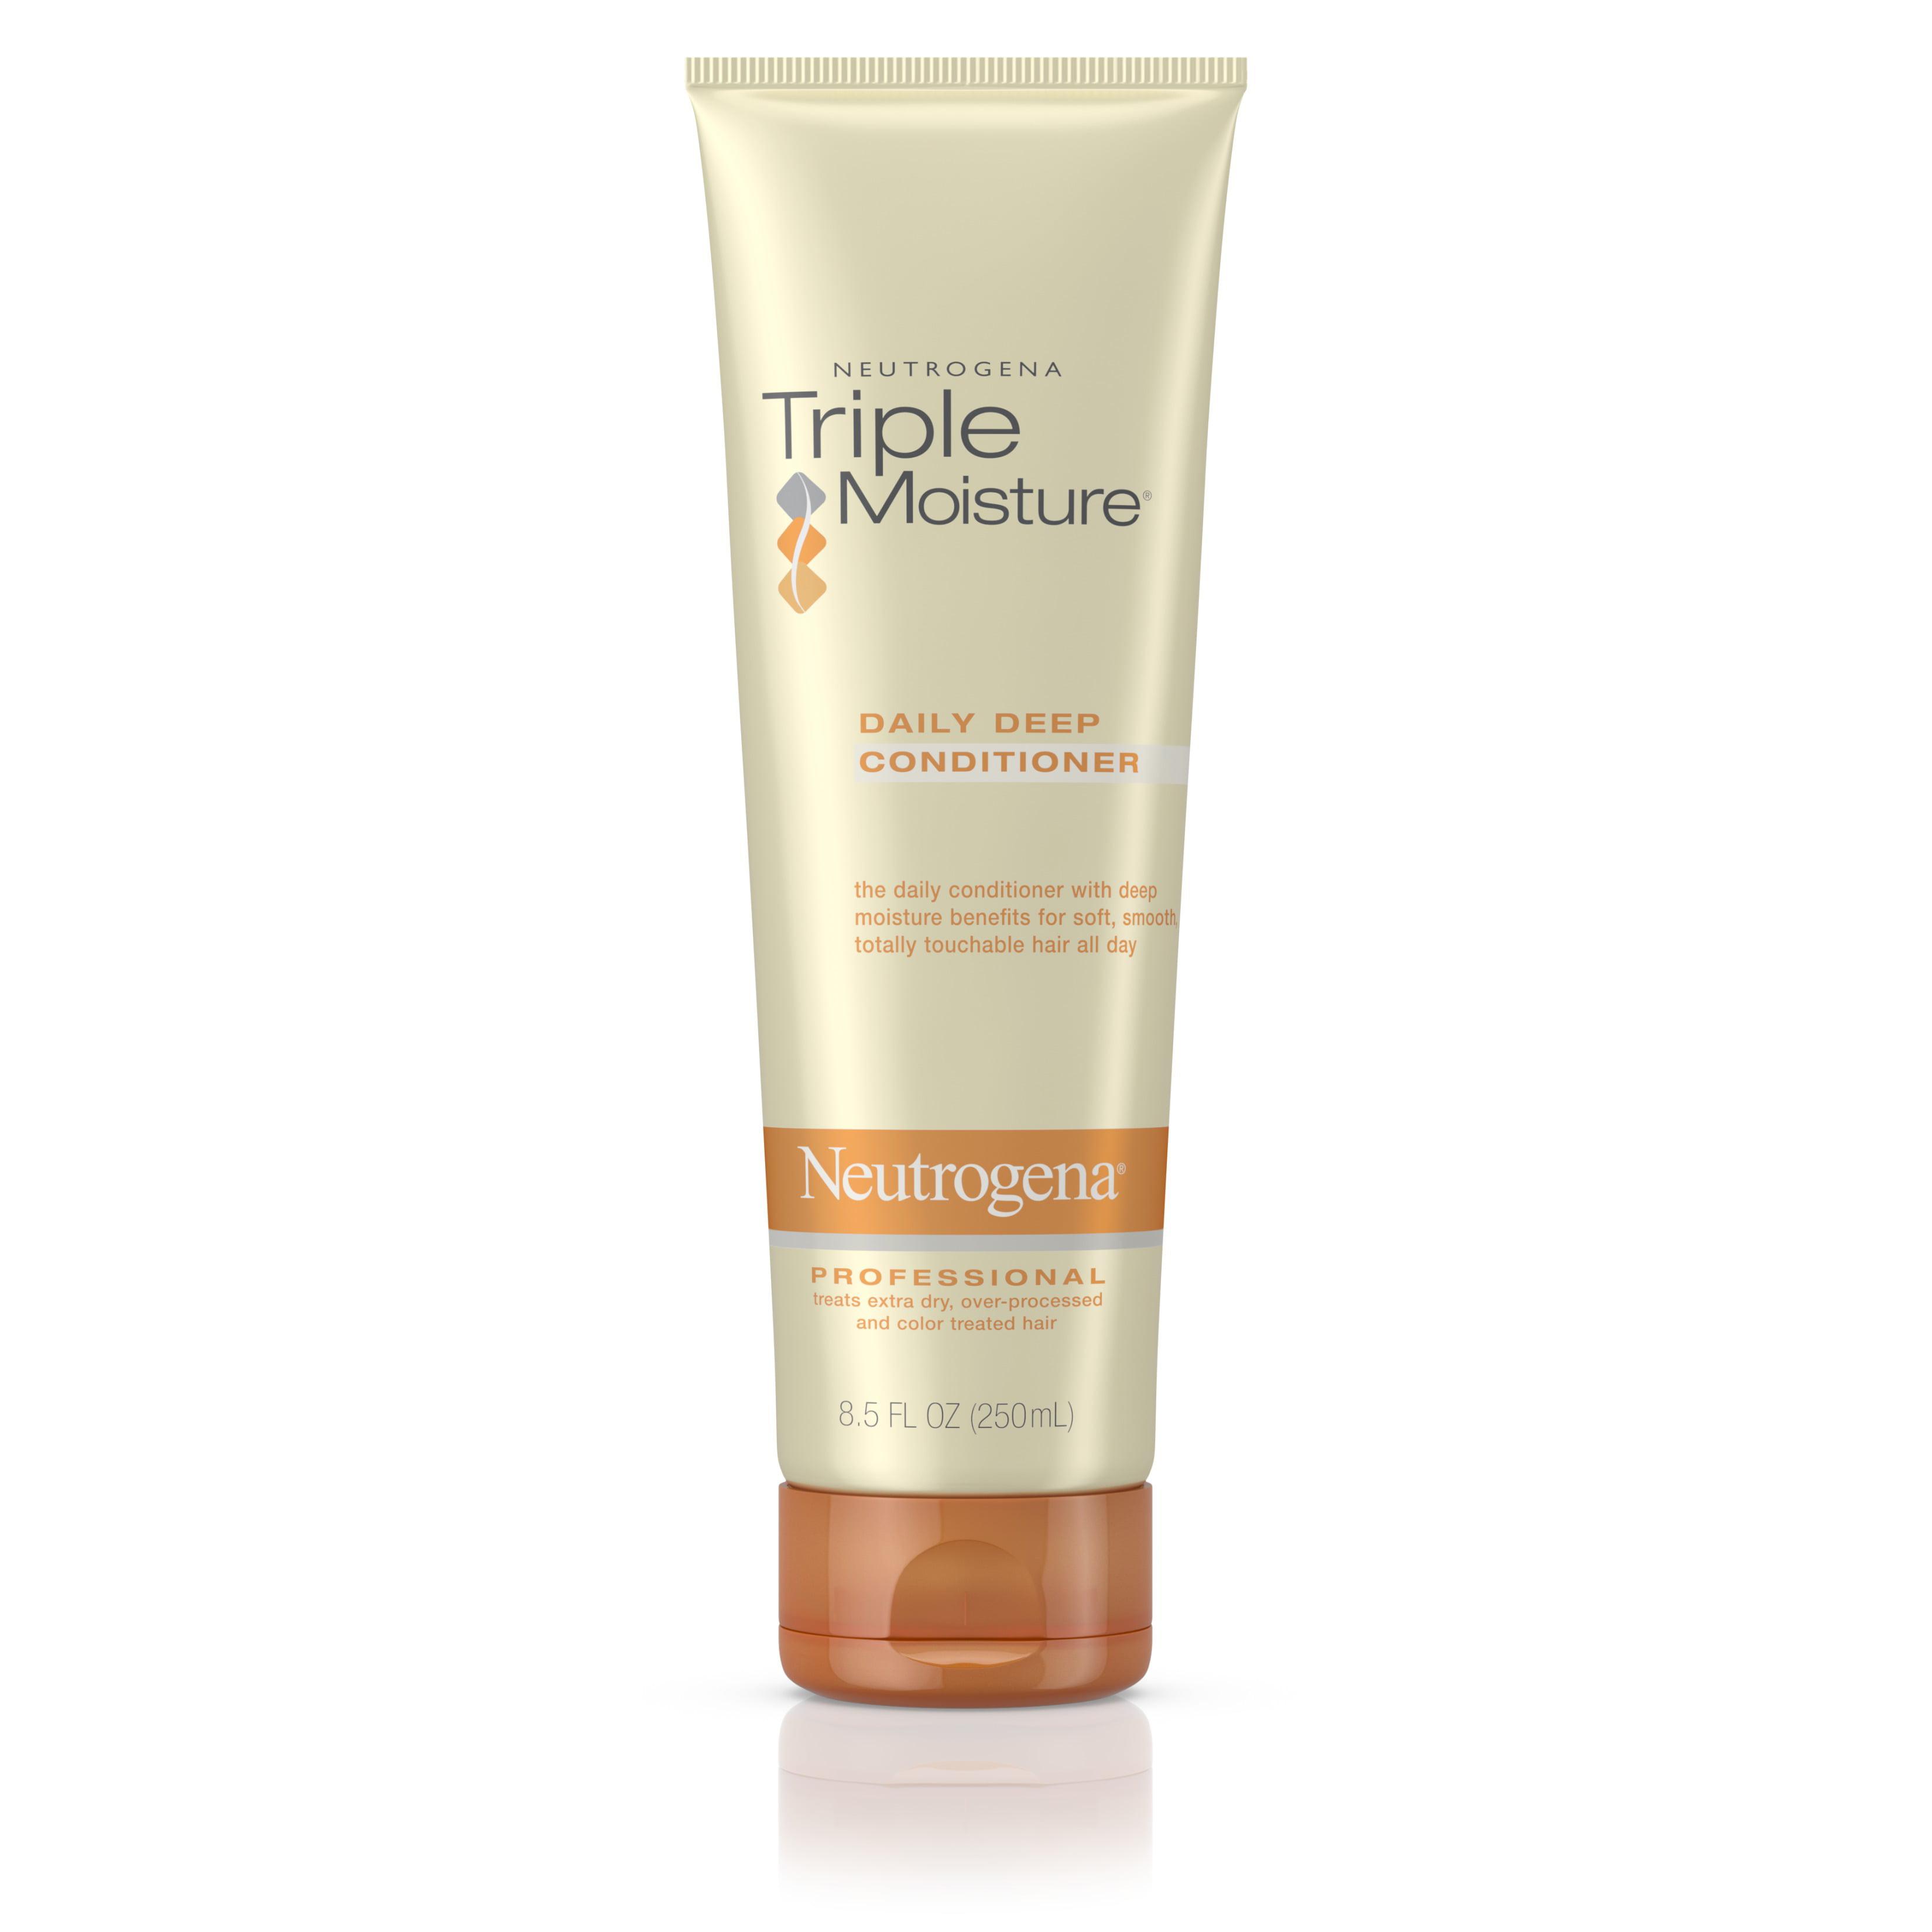 Neutrogena Triple Moisture Daily Deep Hair Conditioner, 8.5 fl. oz